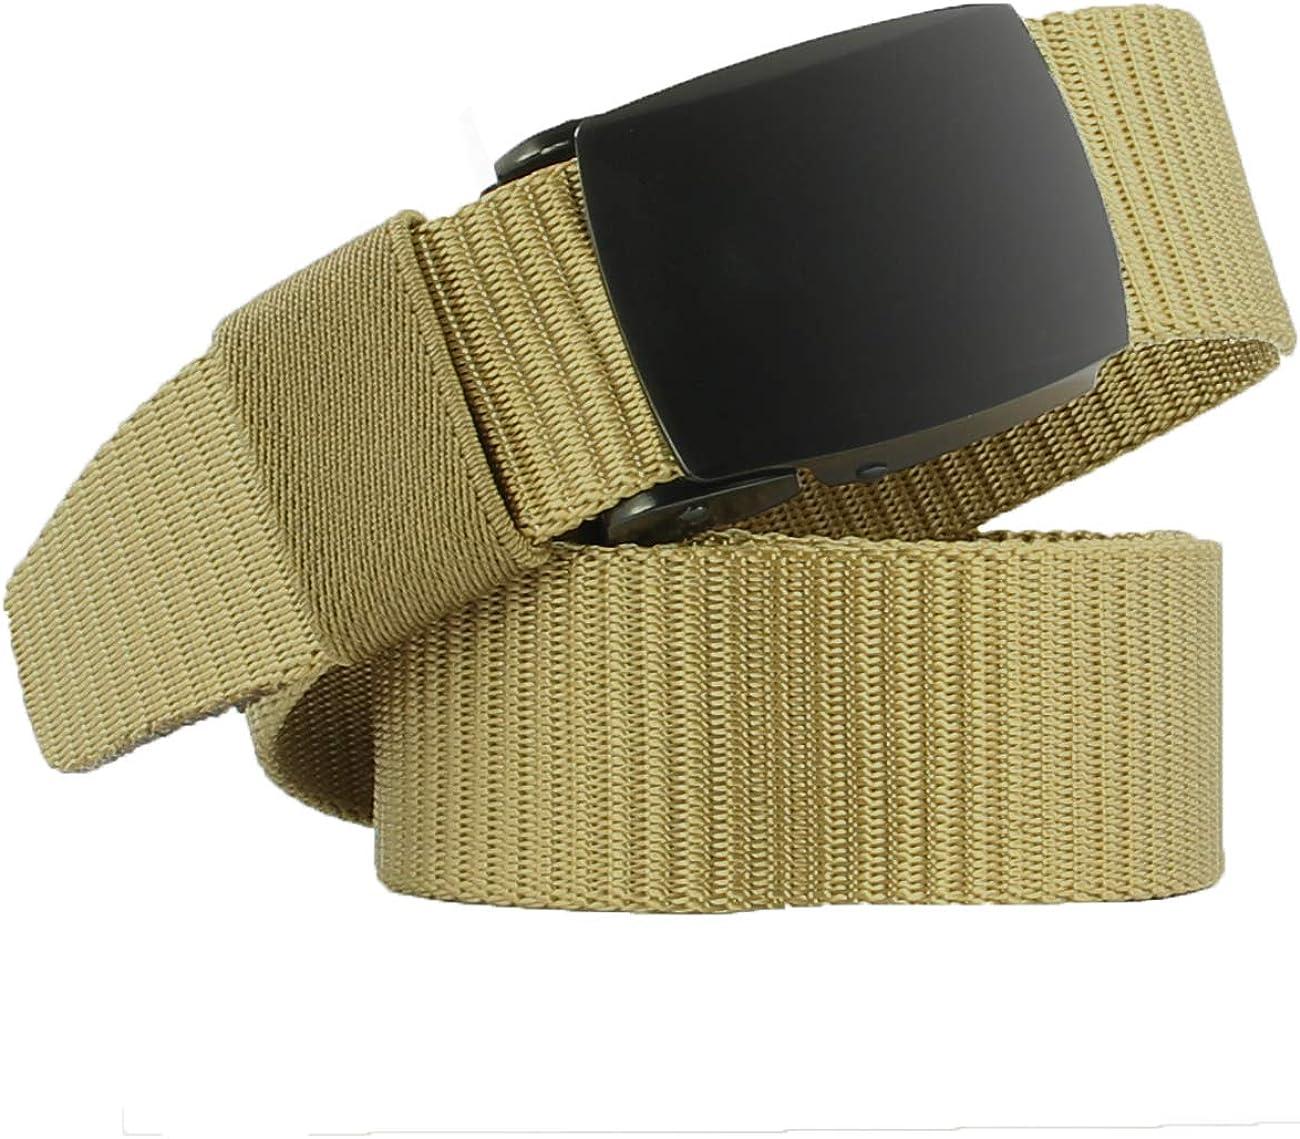 JINIU Christmas Military Canvas Belt for Men with Metal//Plastic Buckle Full Adjustable Solid Color Workout Webbing Belts